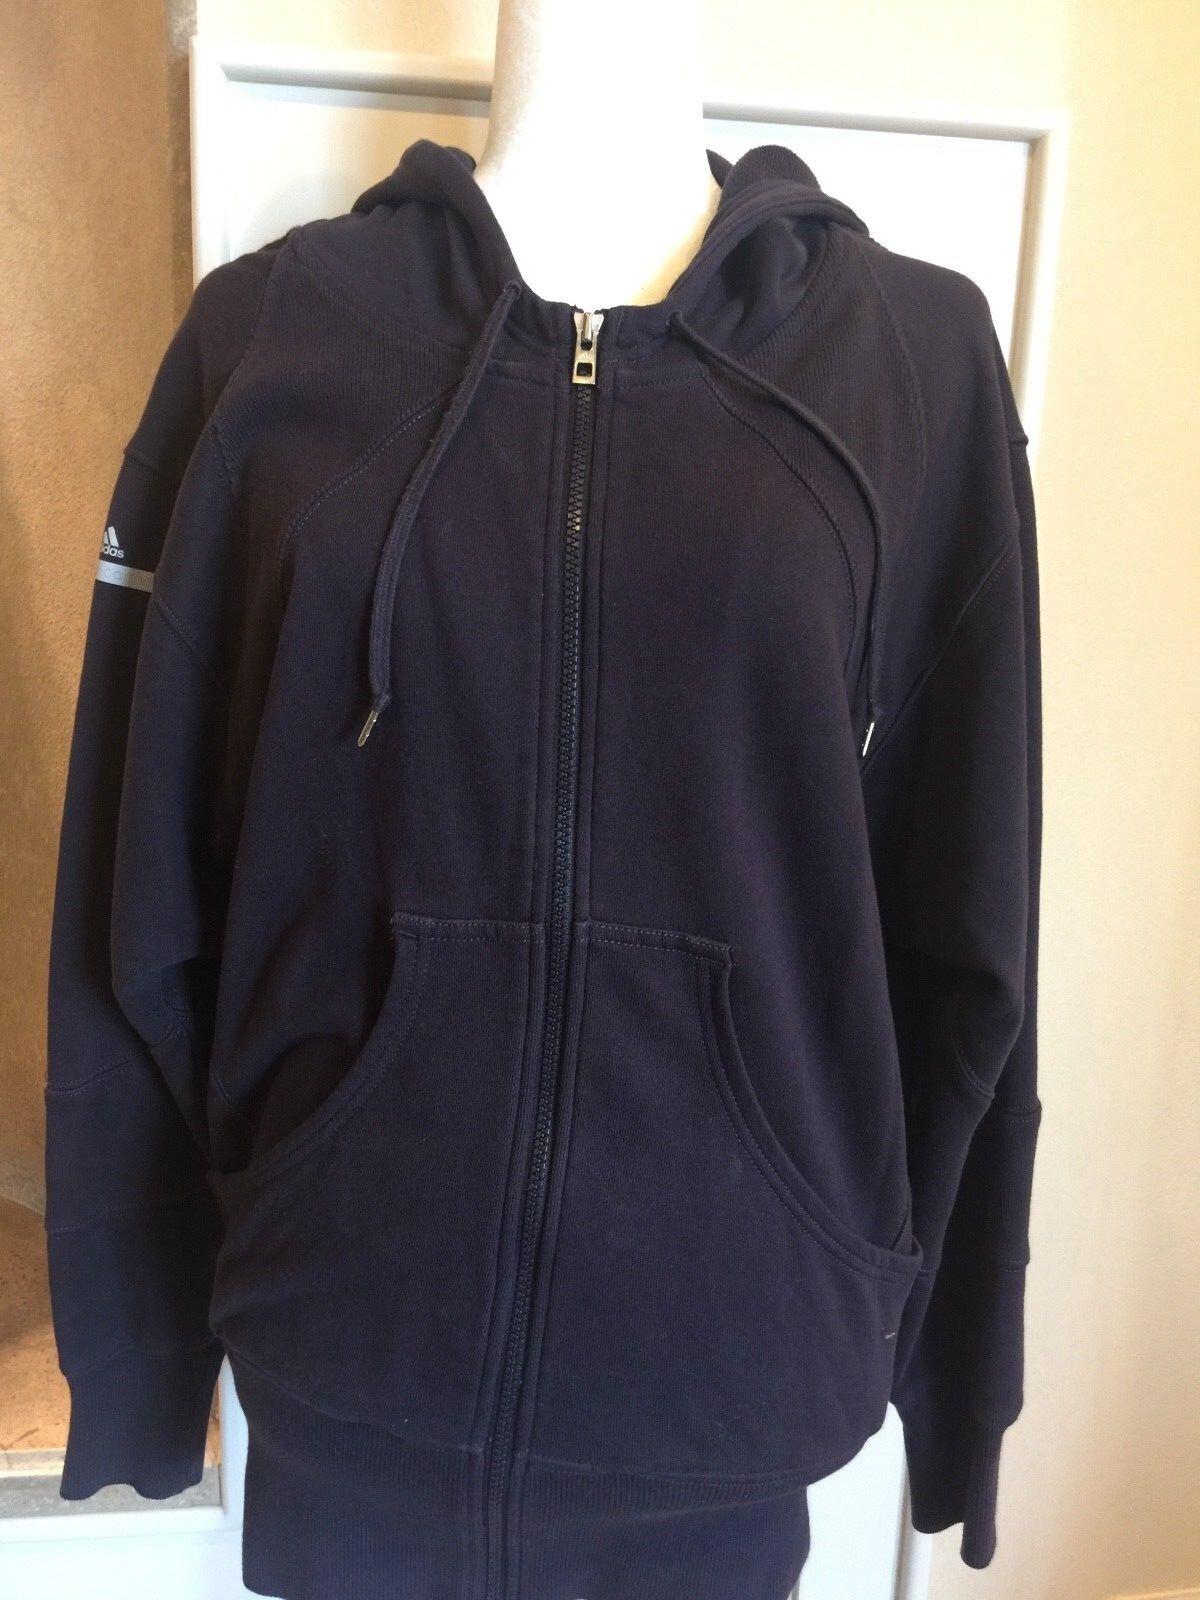 Stella McCartney x Adidas Women's Full Zip Zip Zip up Hoodie Sweater PLUM Size XSMALL de01dd